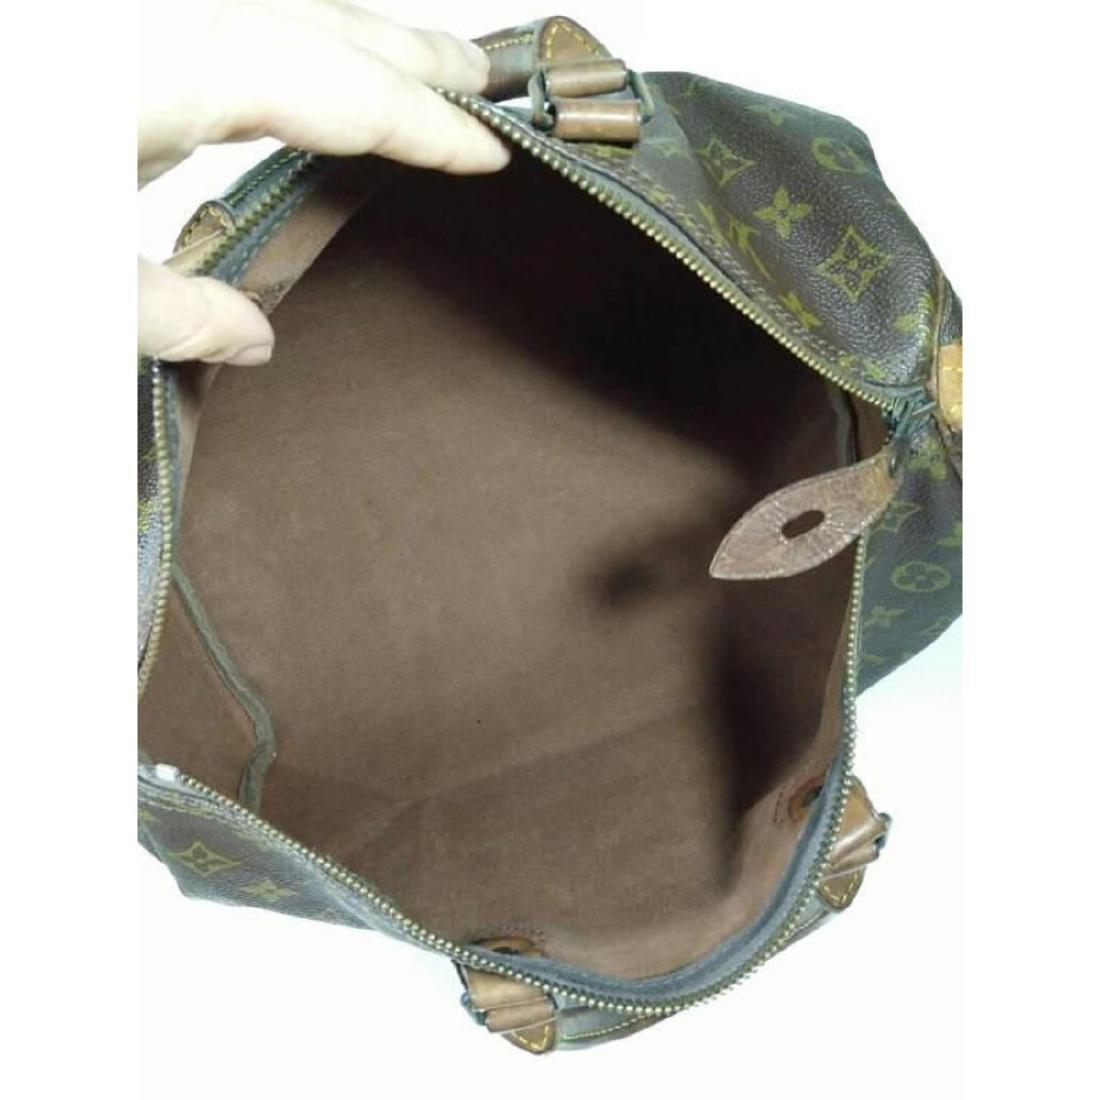 Auth Louis Vuitton Vintage Handbag Speedy 35 Monogram - 2